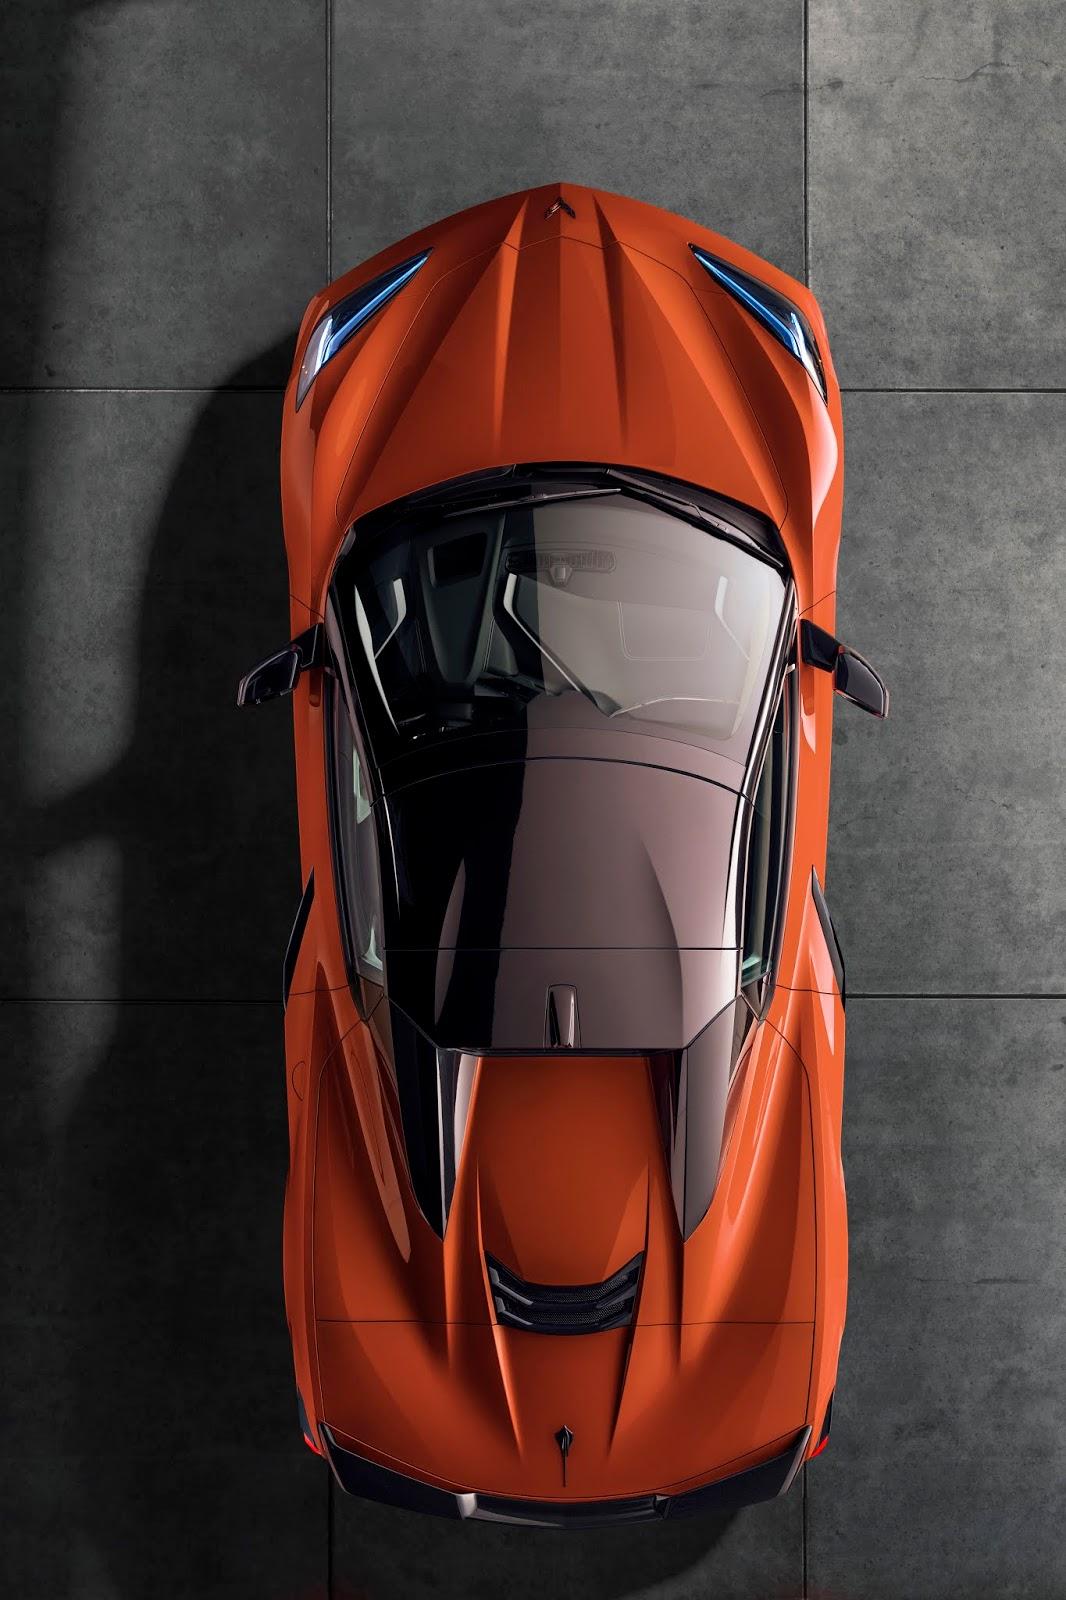 2020 Chevrolet Corvette Stingray Convertible 014 Γιατί η C8 Convertible είναι η καλύτερη Corvette ever C8, Chevrolet, Chevrolet Corvette, Corvette, zblog, ειδήσεις, καινούργιο, καινούρια, καινούριο